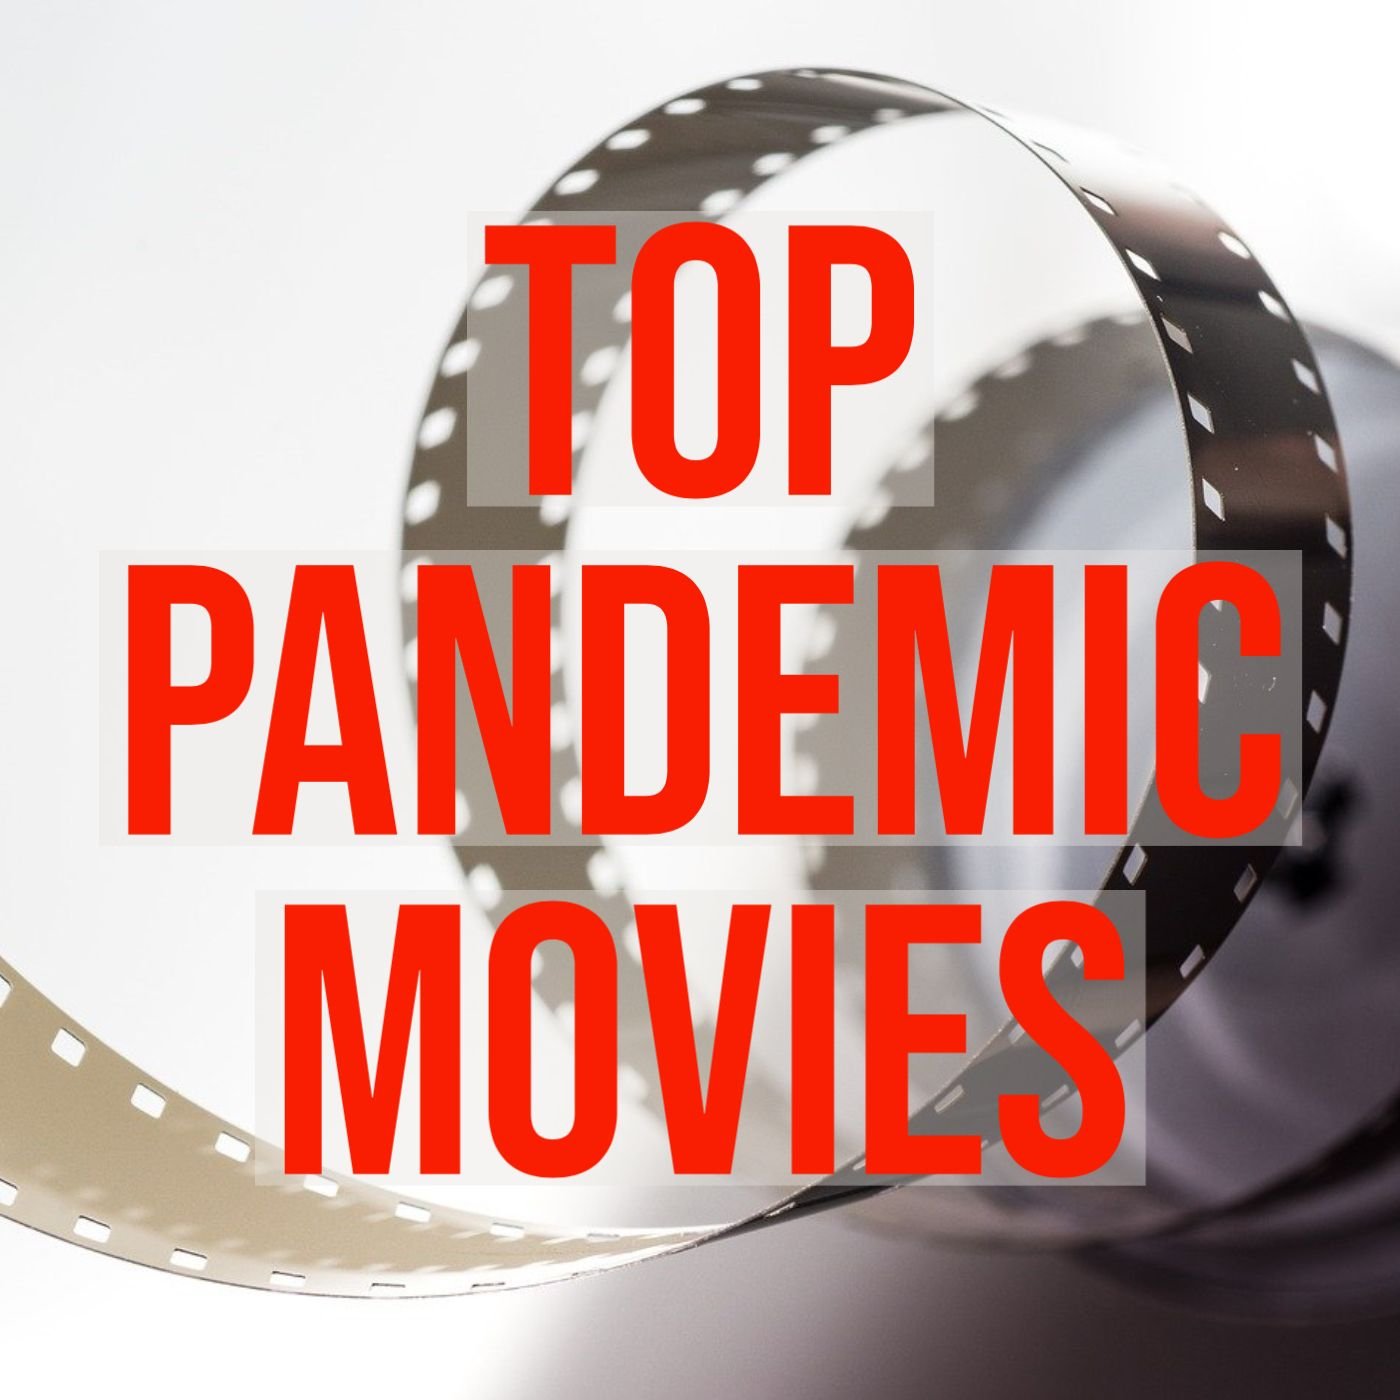 Top Pandemic Movies